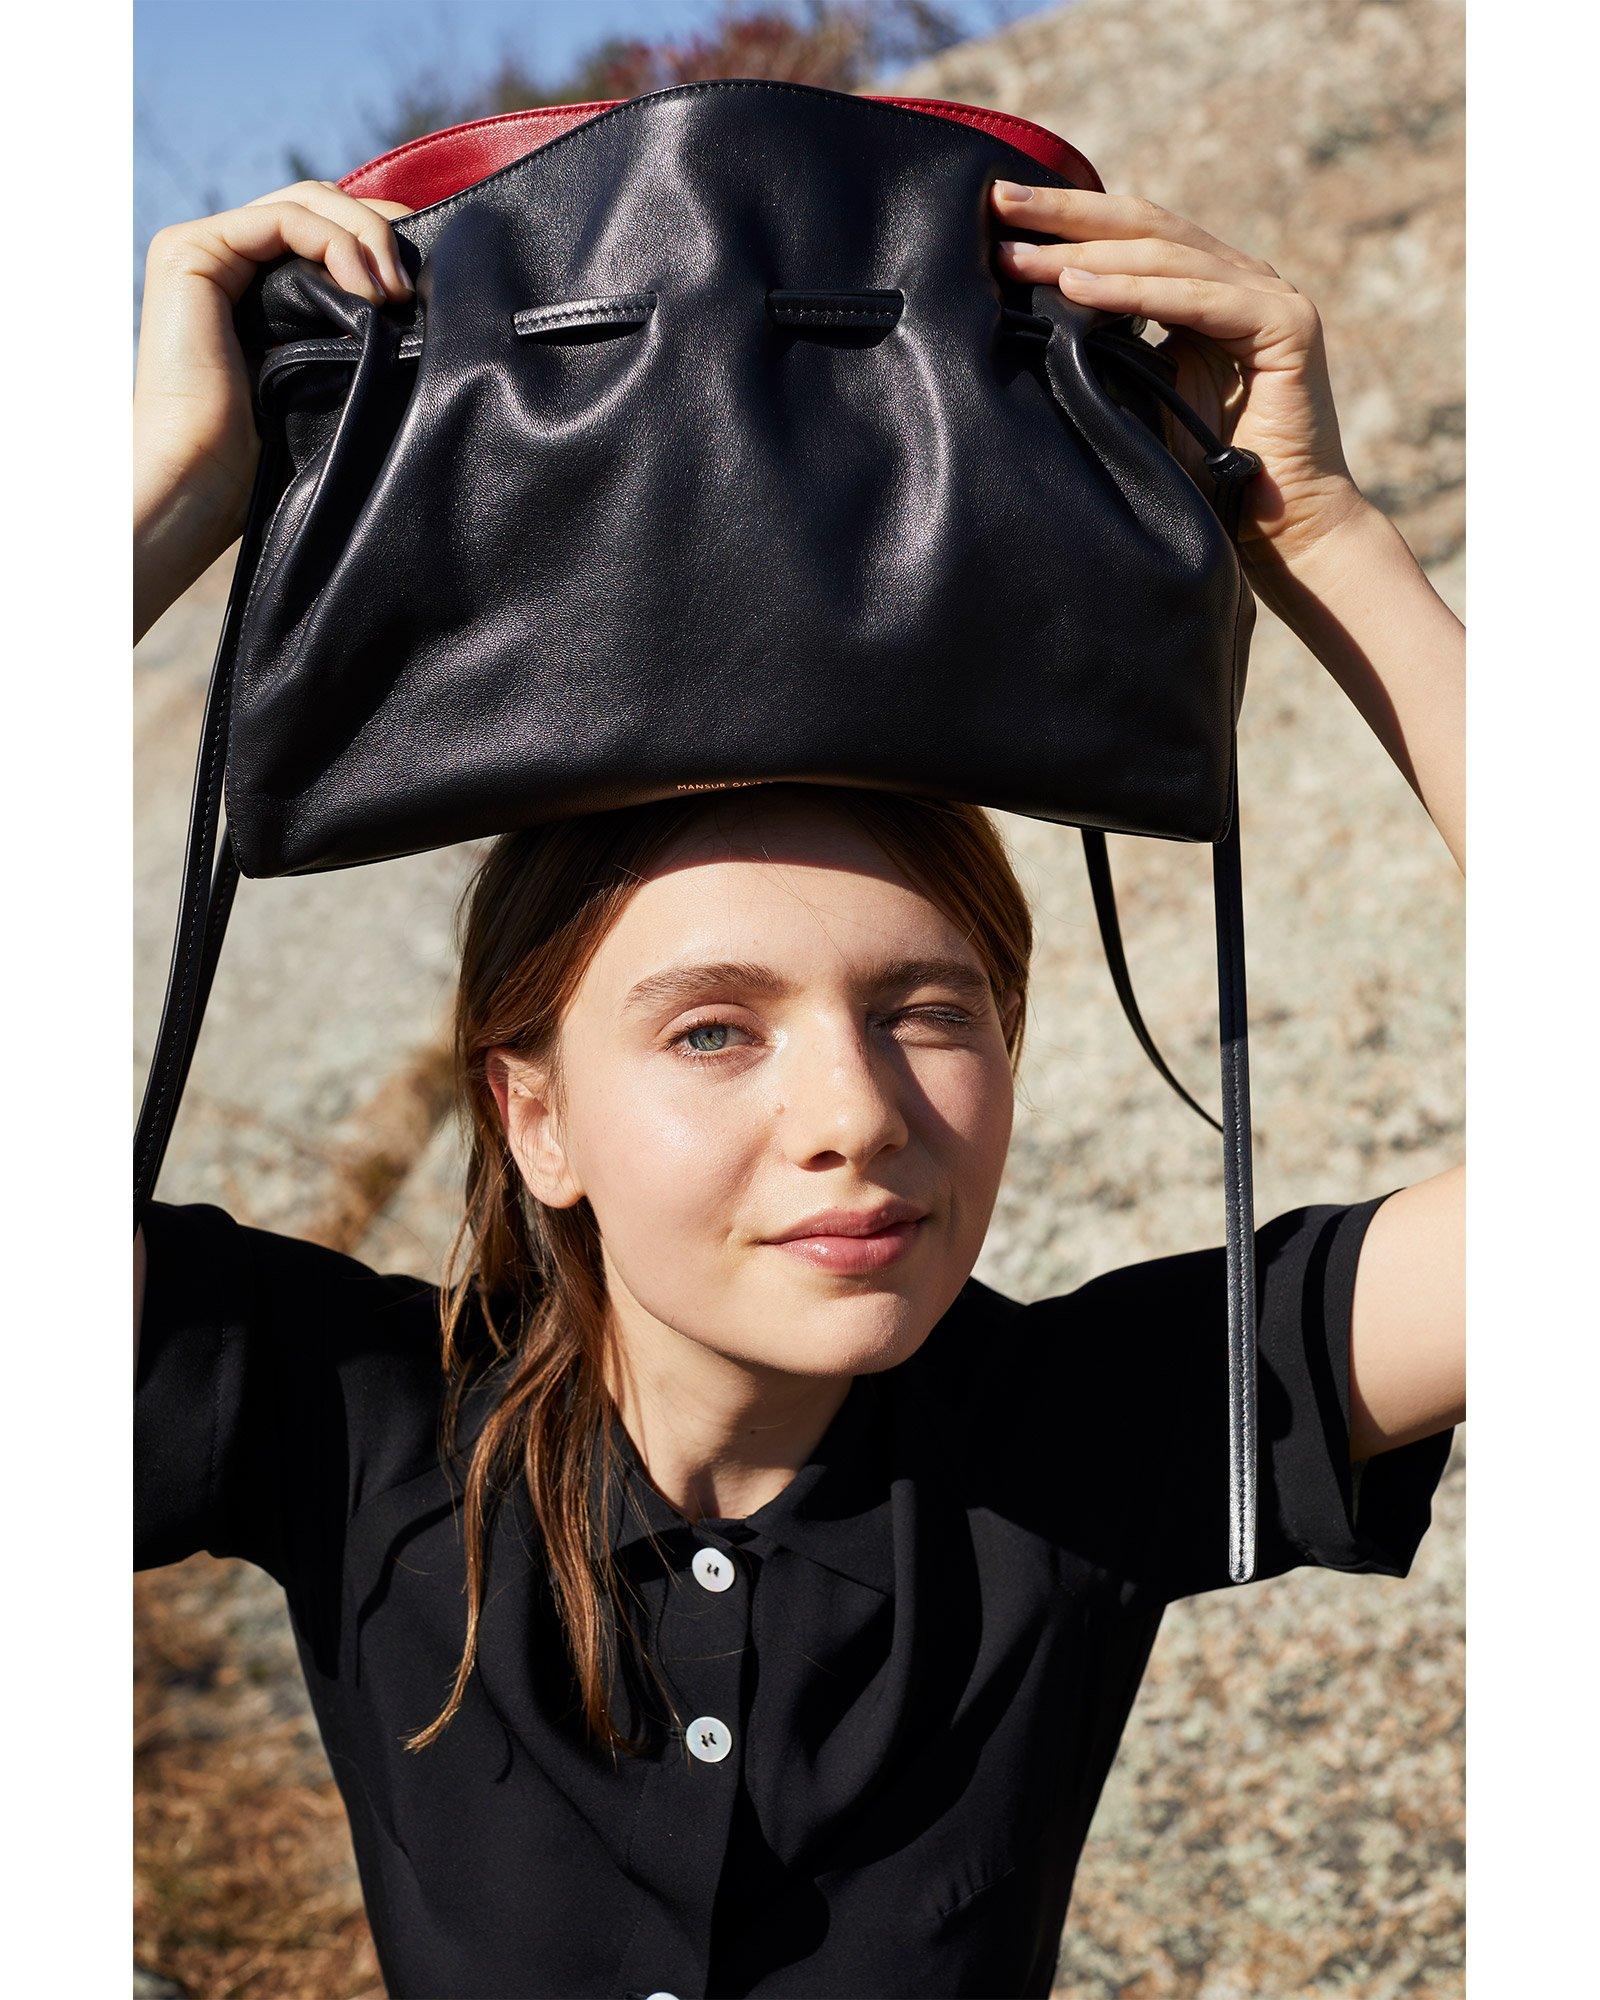 Protea Bags